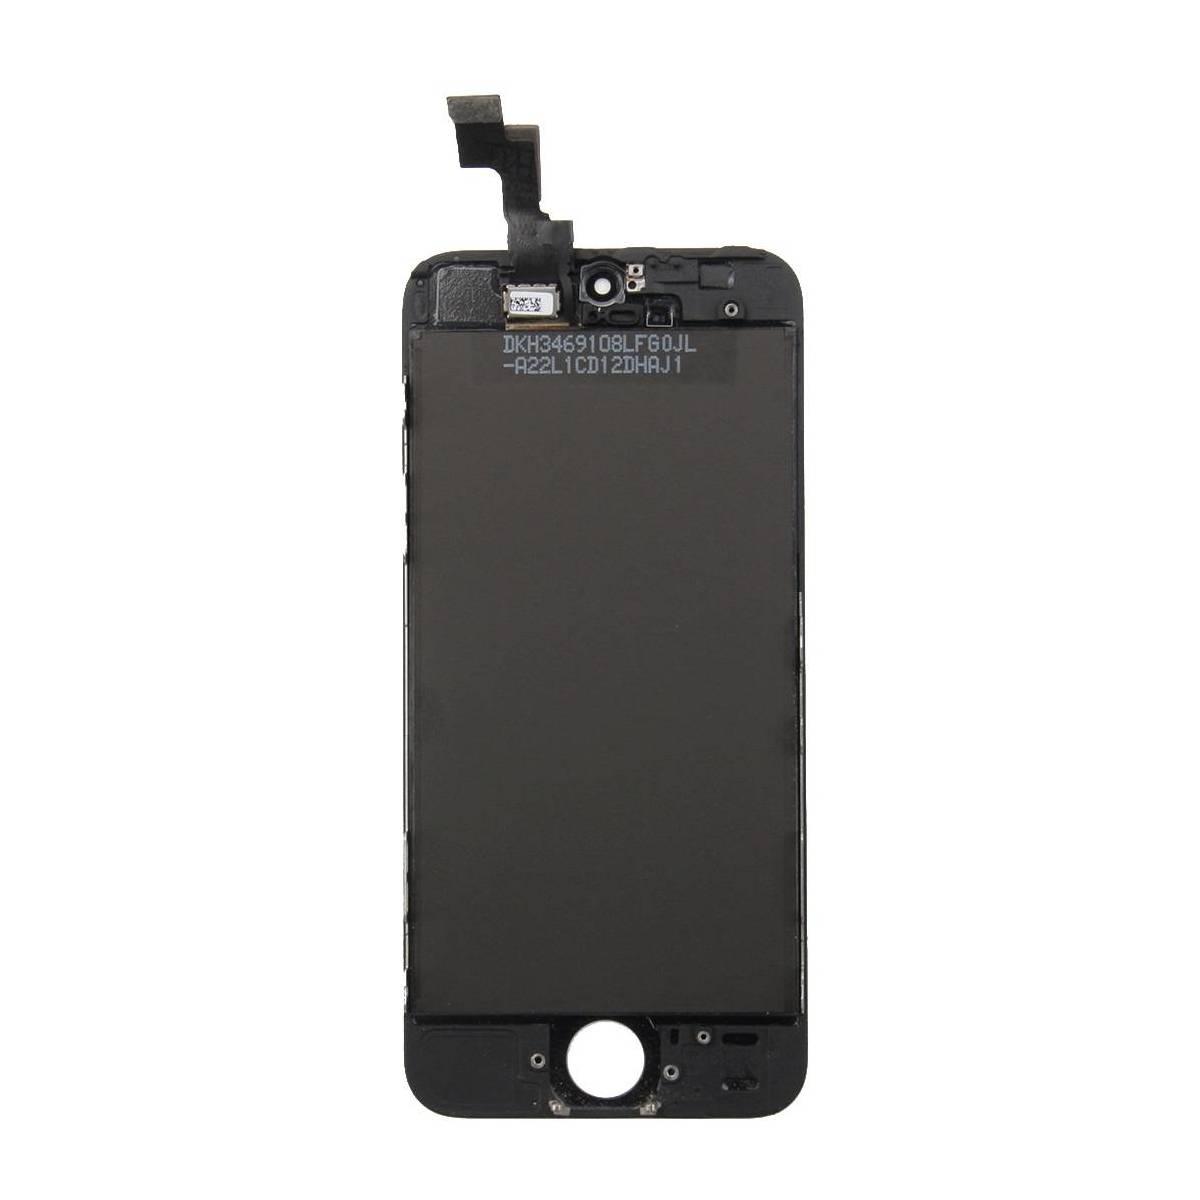 iphone 5 skärm prisjakt